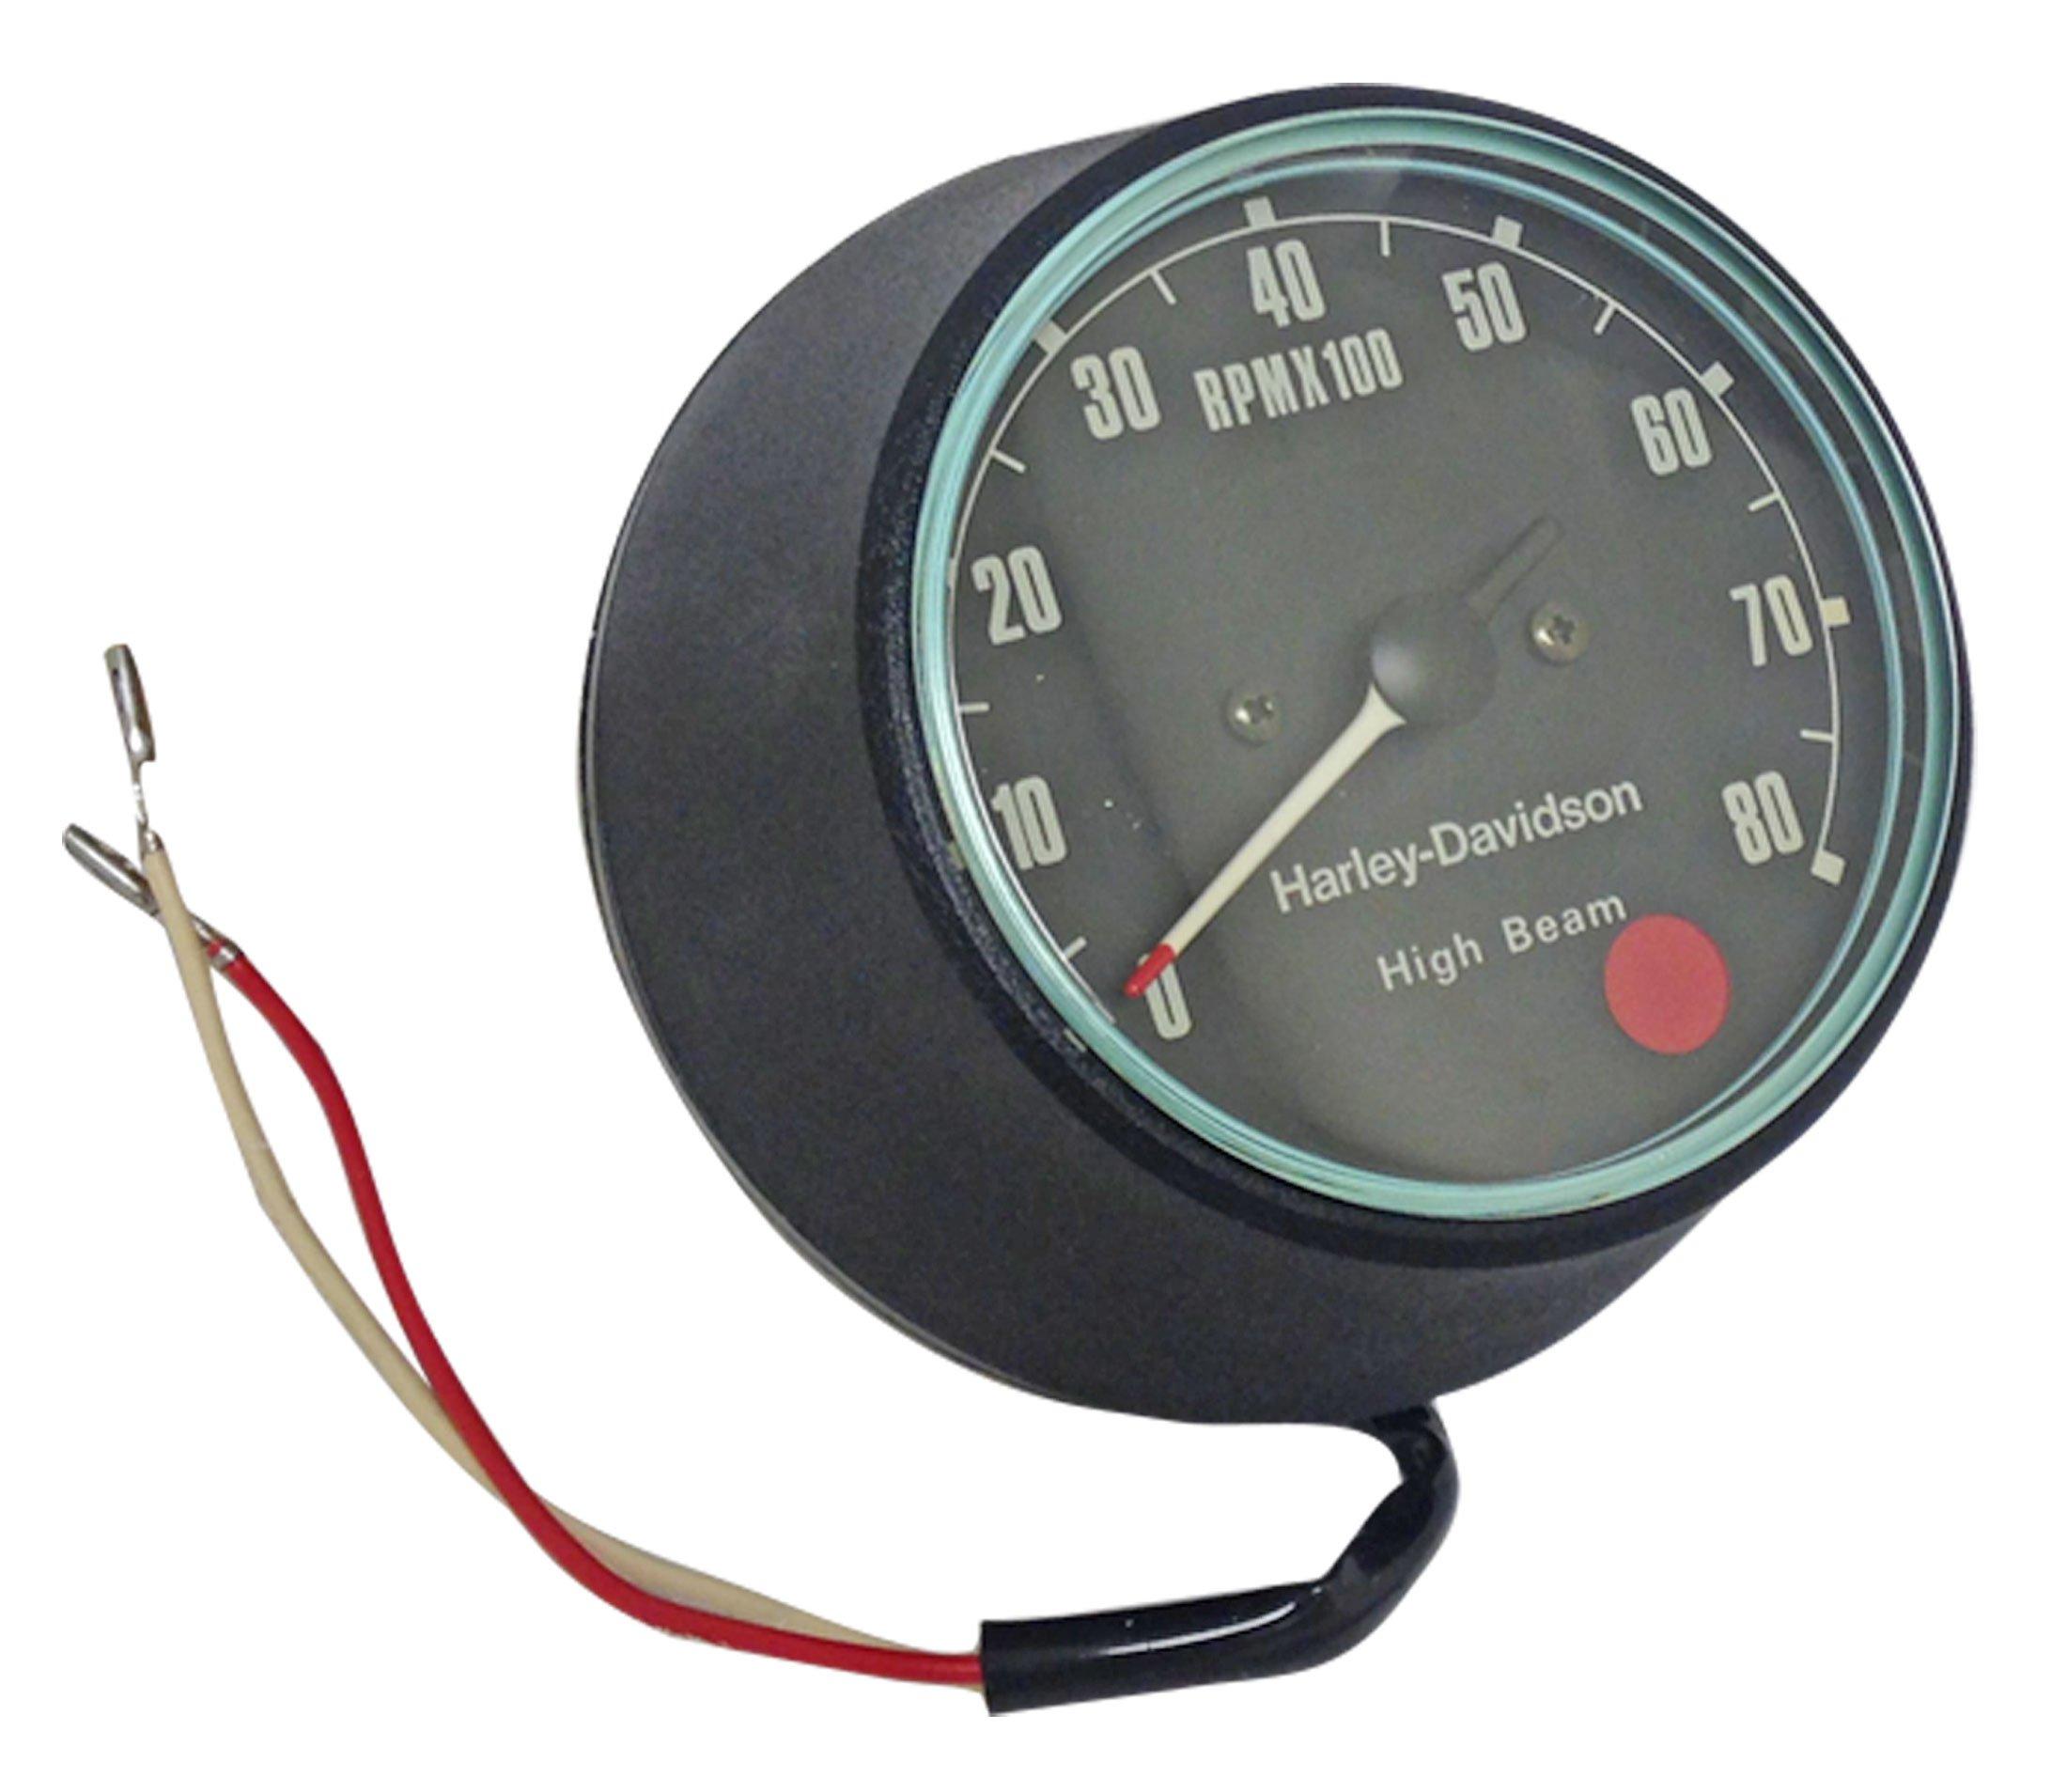 Tachometer Gauge Harley-Davidson Sportster FXR Red Dot Tach Motorcycle by BMI Karts